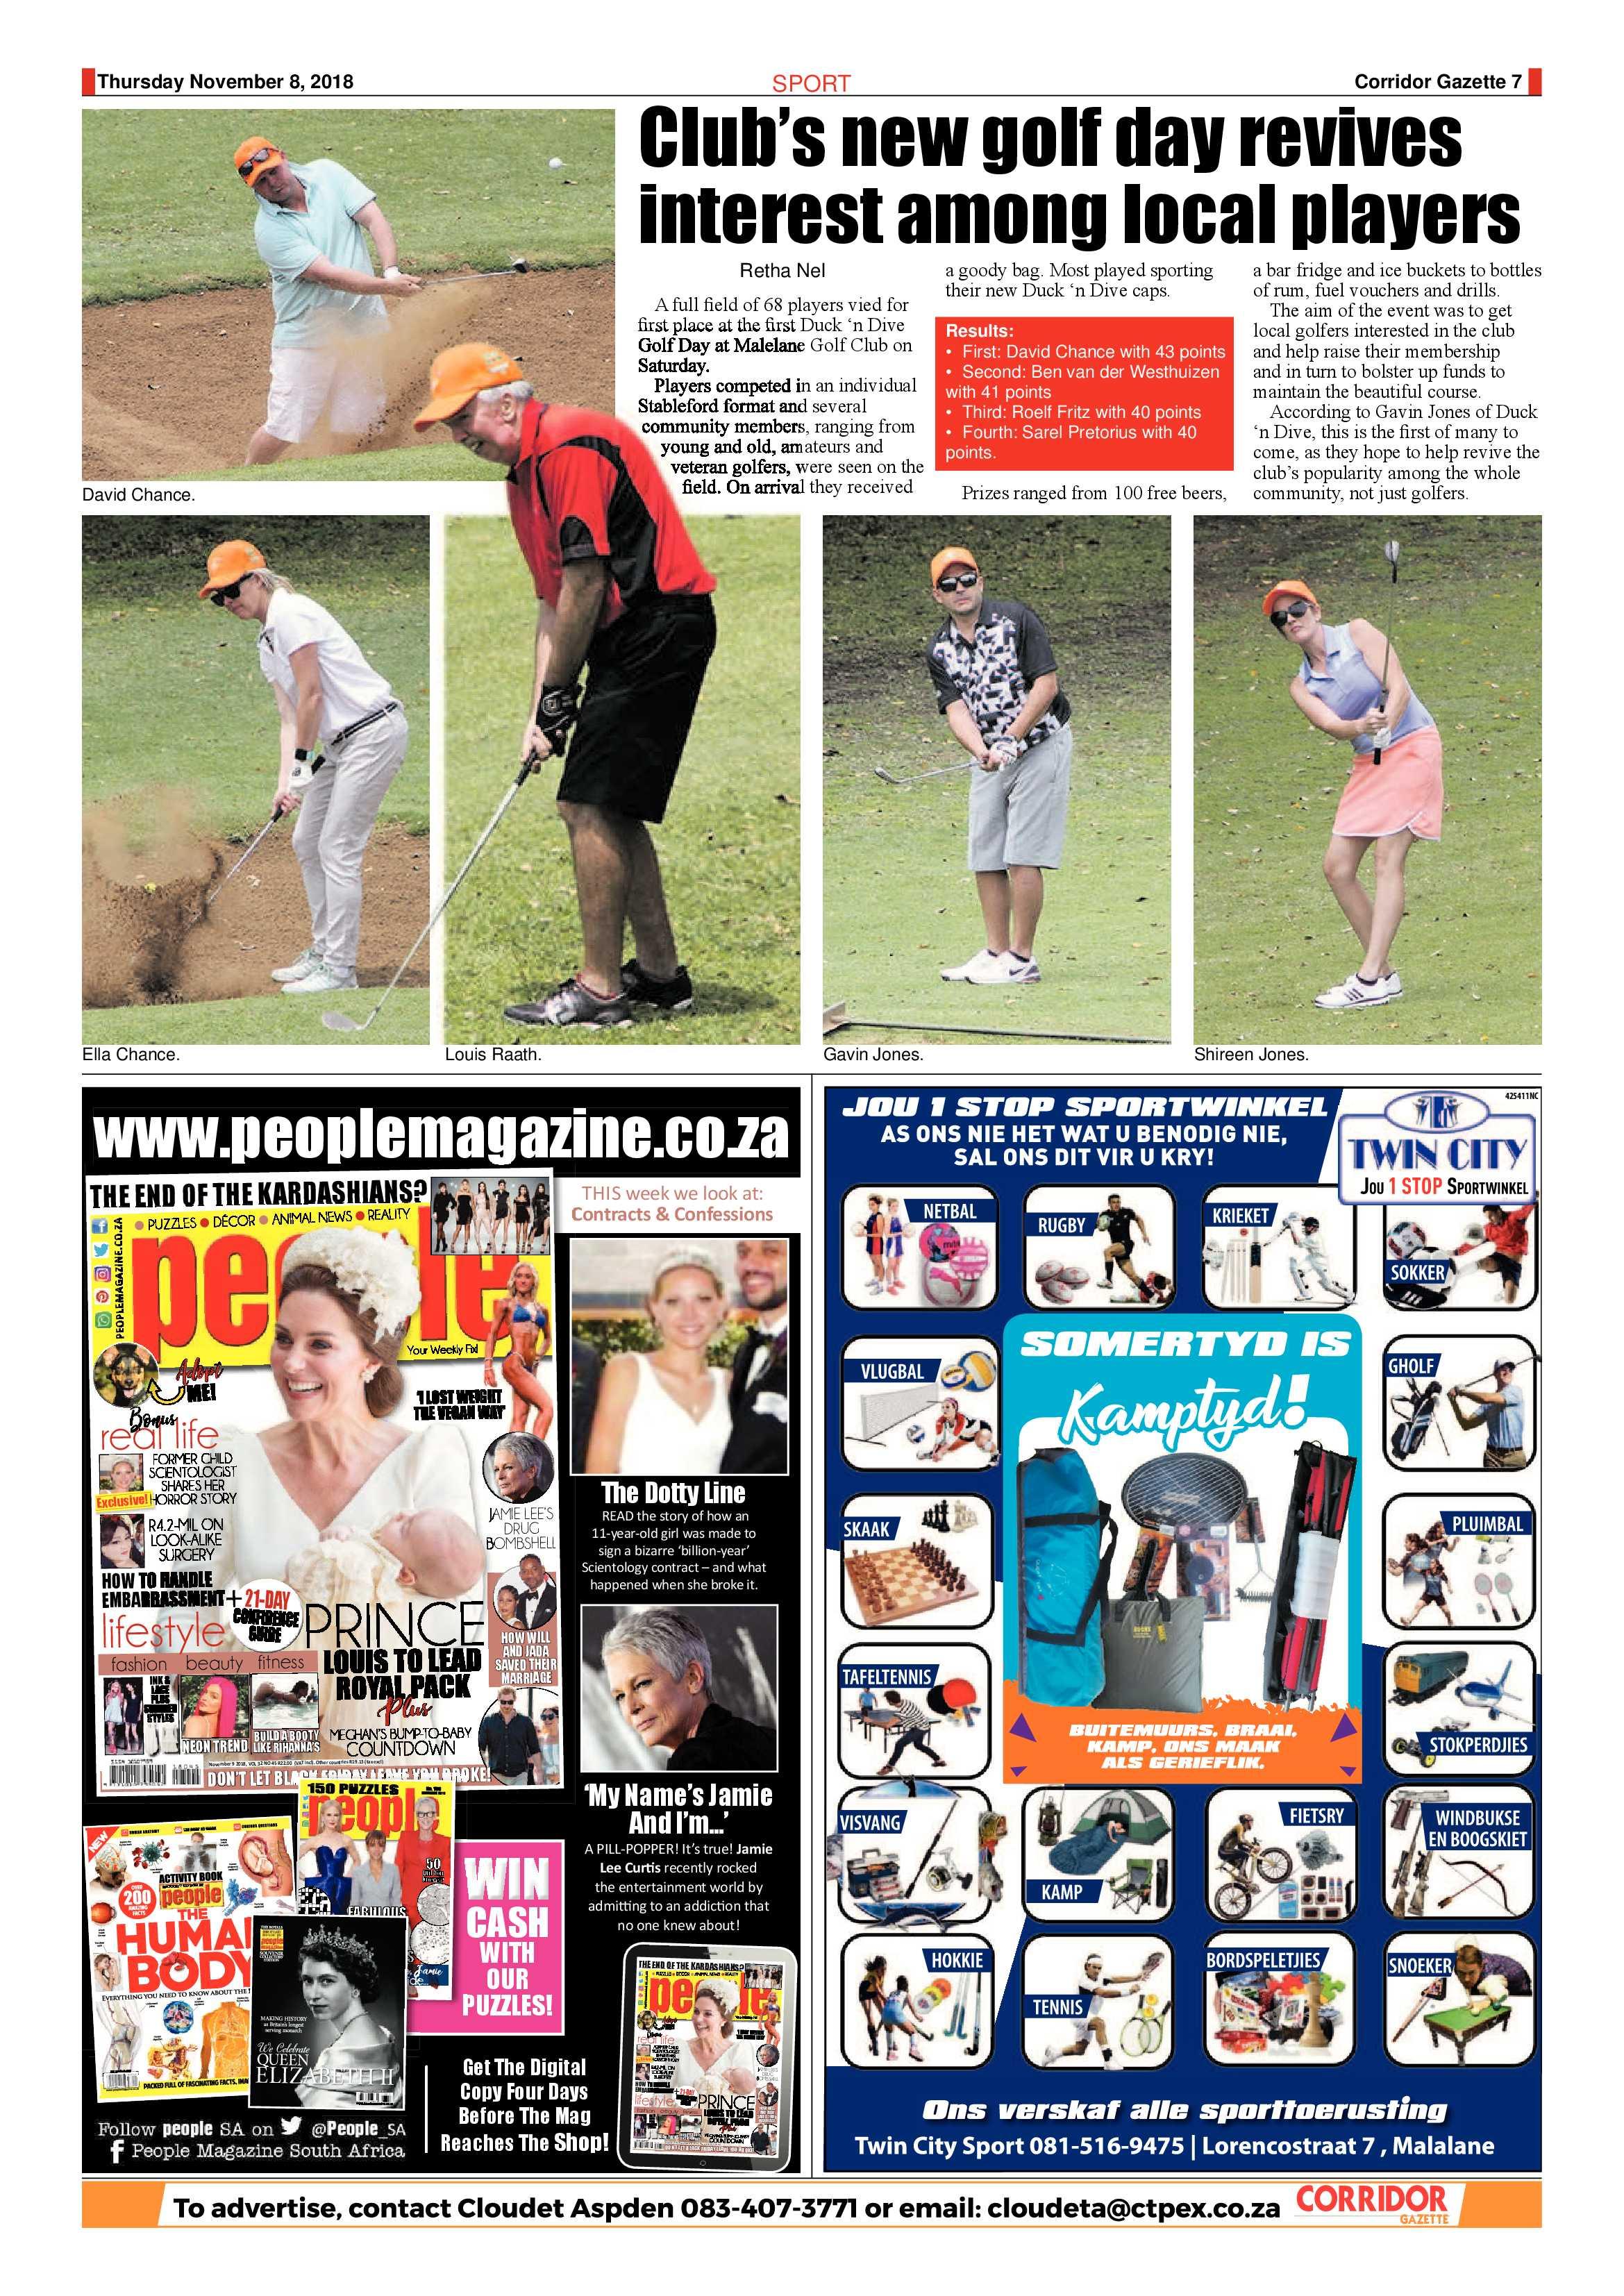 corridor-gazette-8-november-2018-epapers-page-7